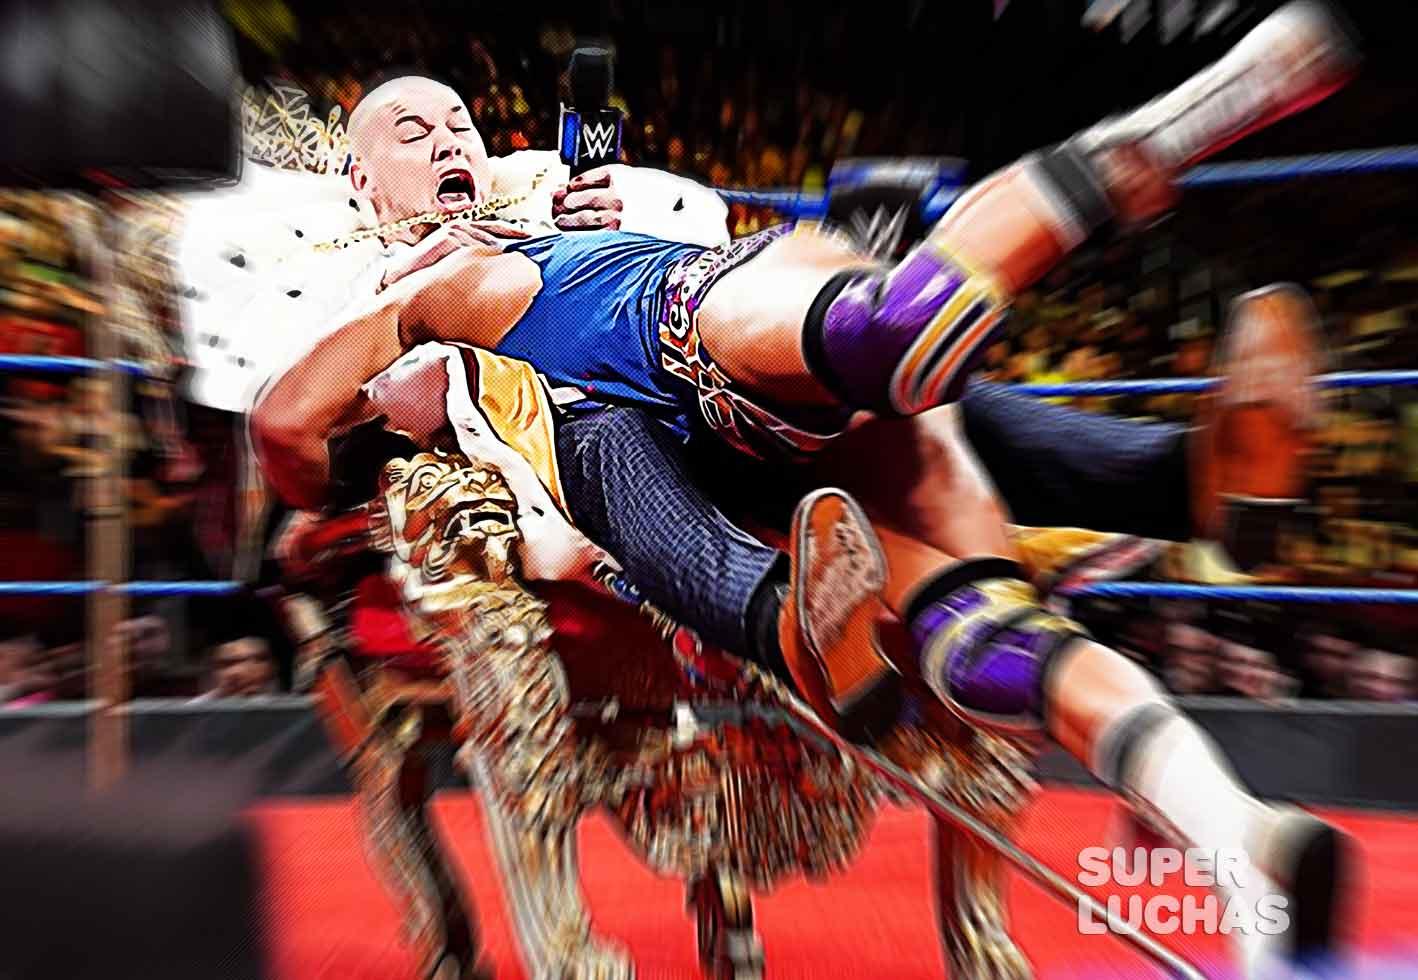 Chad Gable vs. Baron Corbin